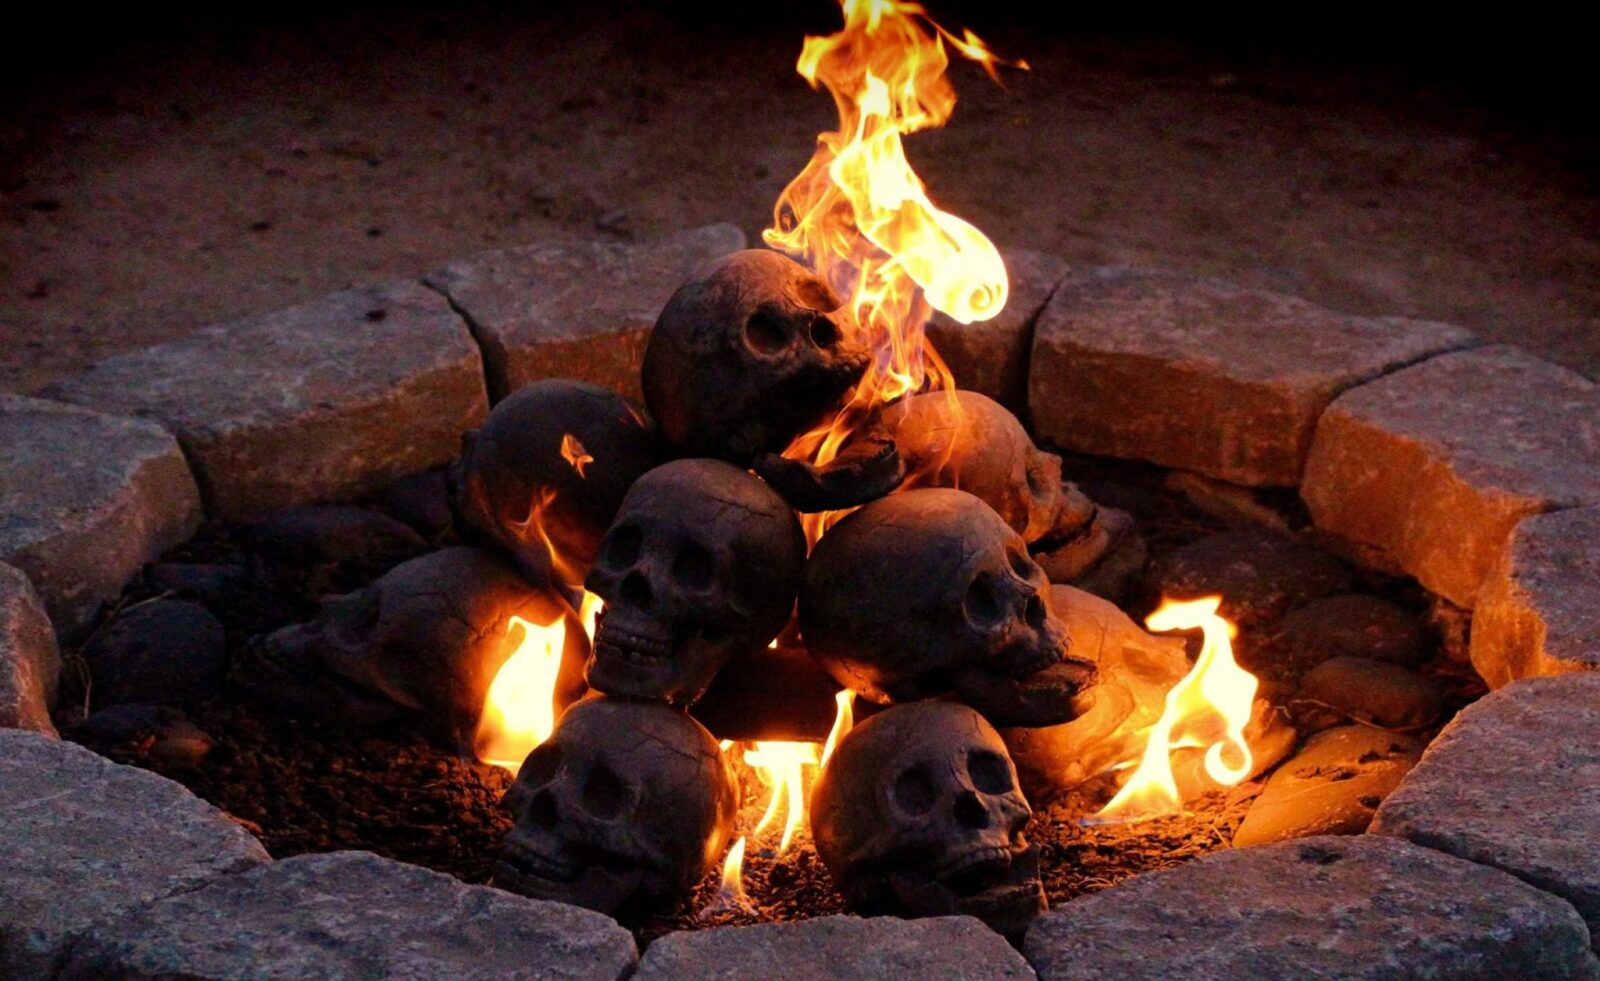 Skull Fire Logs 1600x981